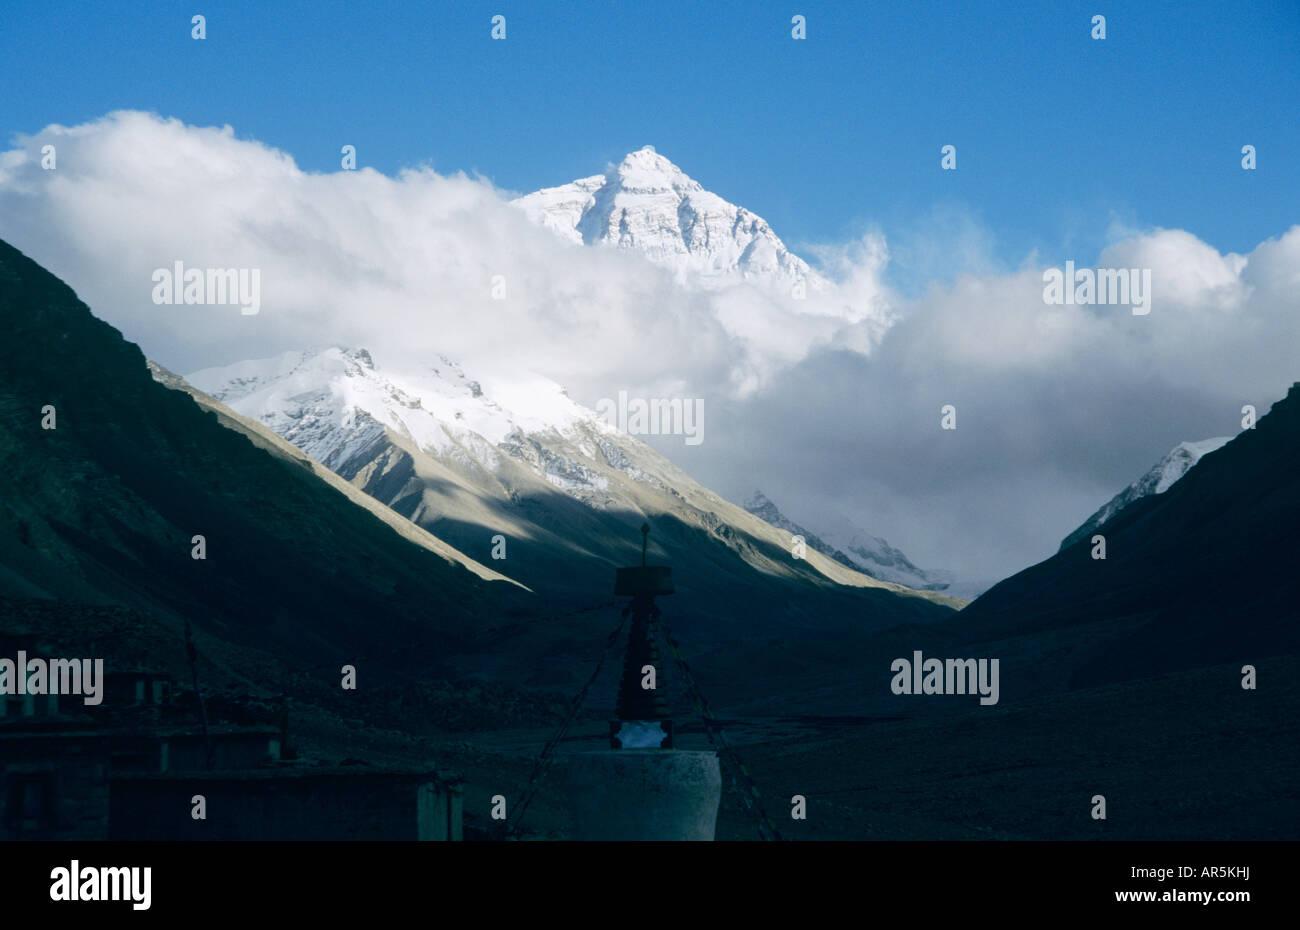 Mount everest and rongbuk monastery - Stock Image